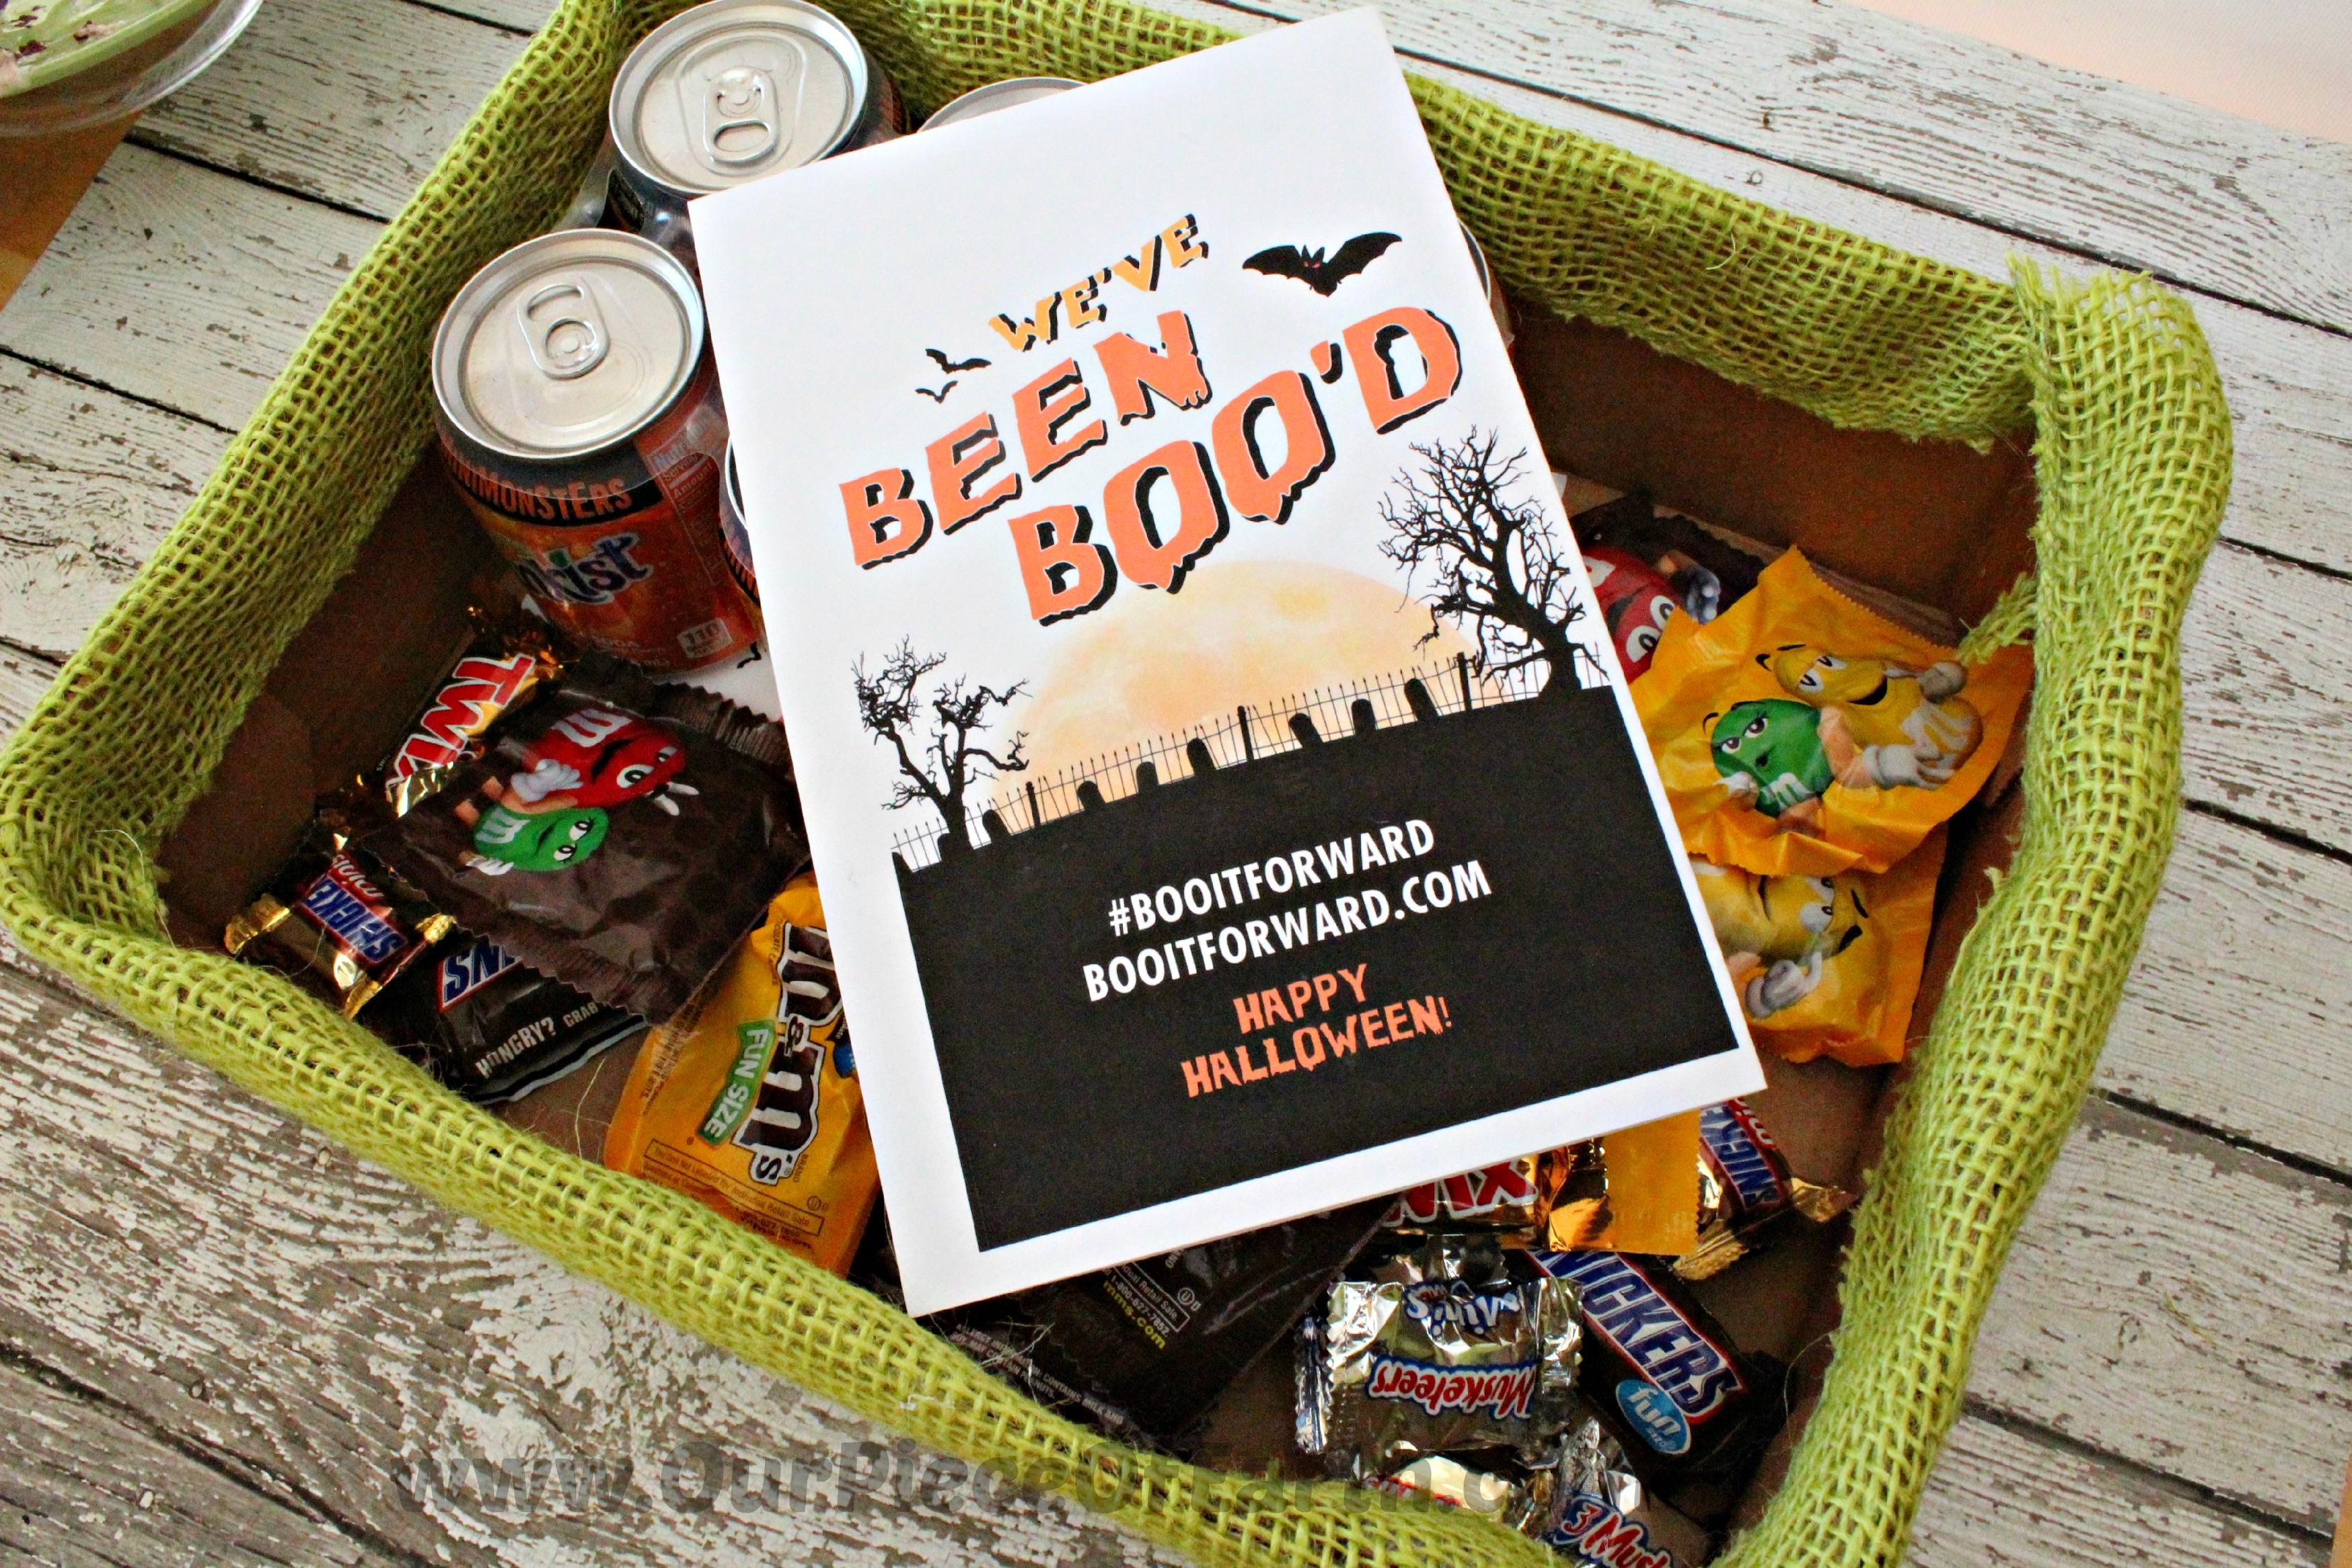 Halloween gift idea. We've been BOO'd #BOOItForward